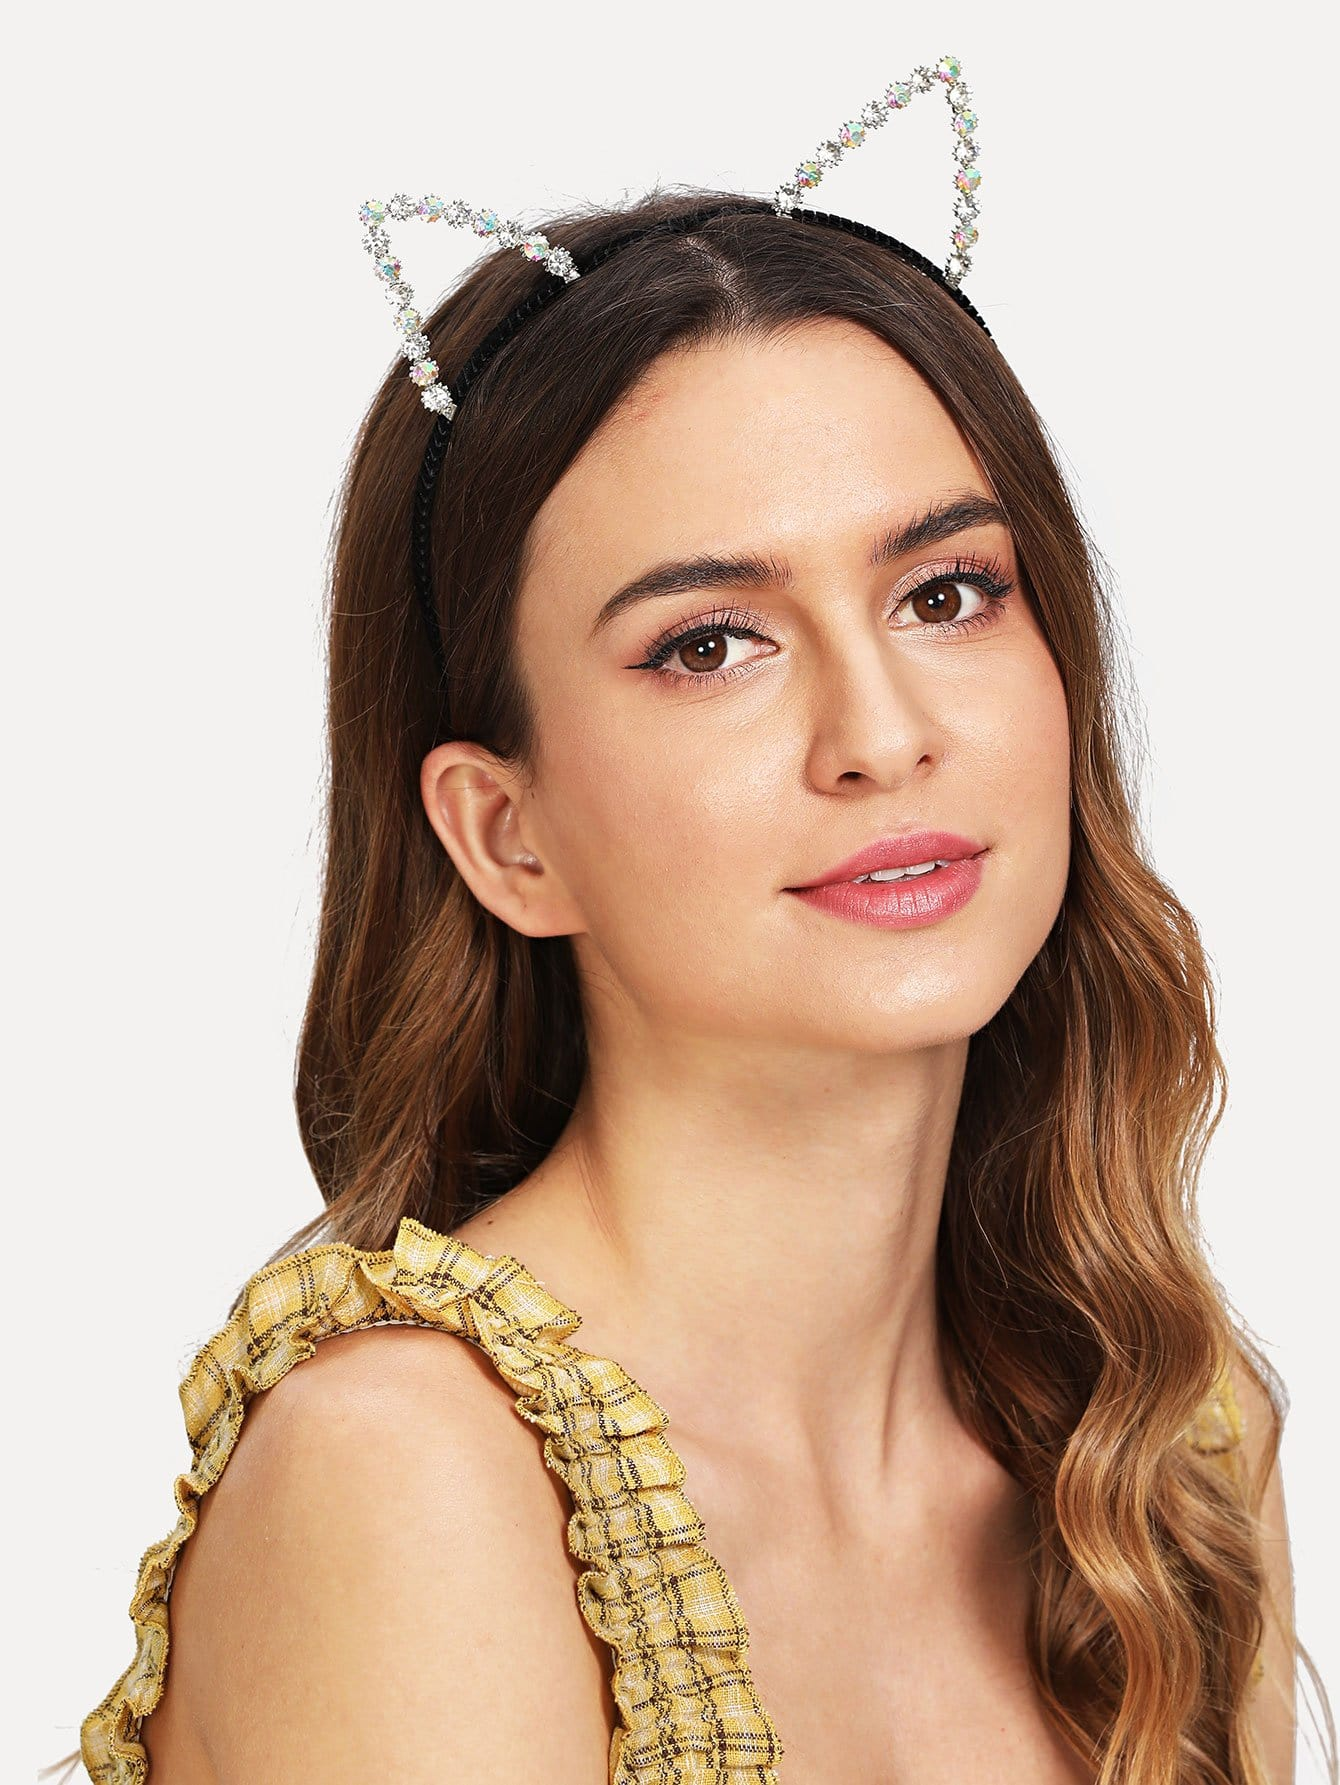 Cat Ear Design Headband With Rhinestone stripe print ear design kids headband